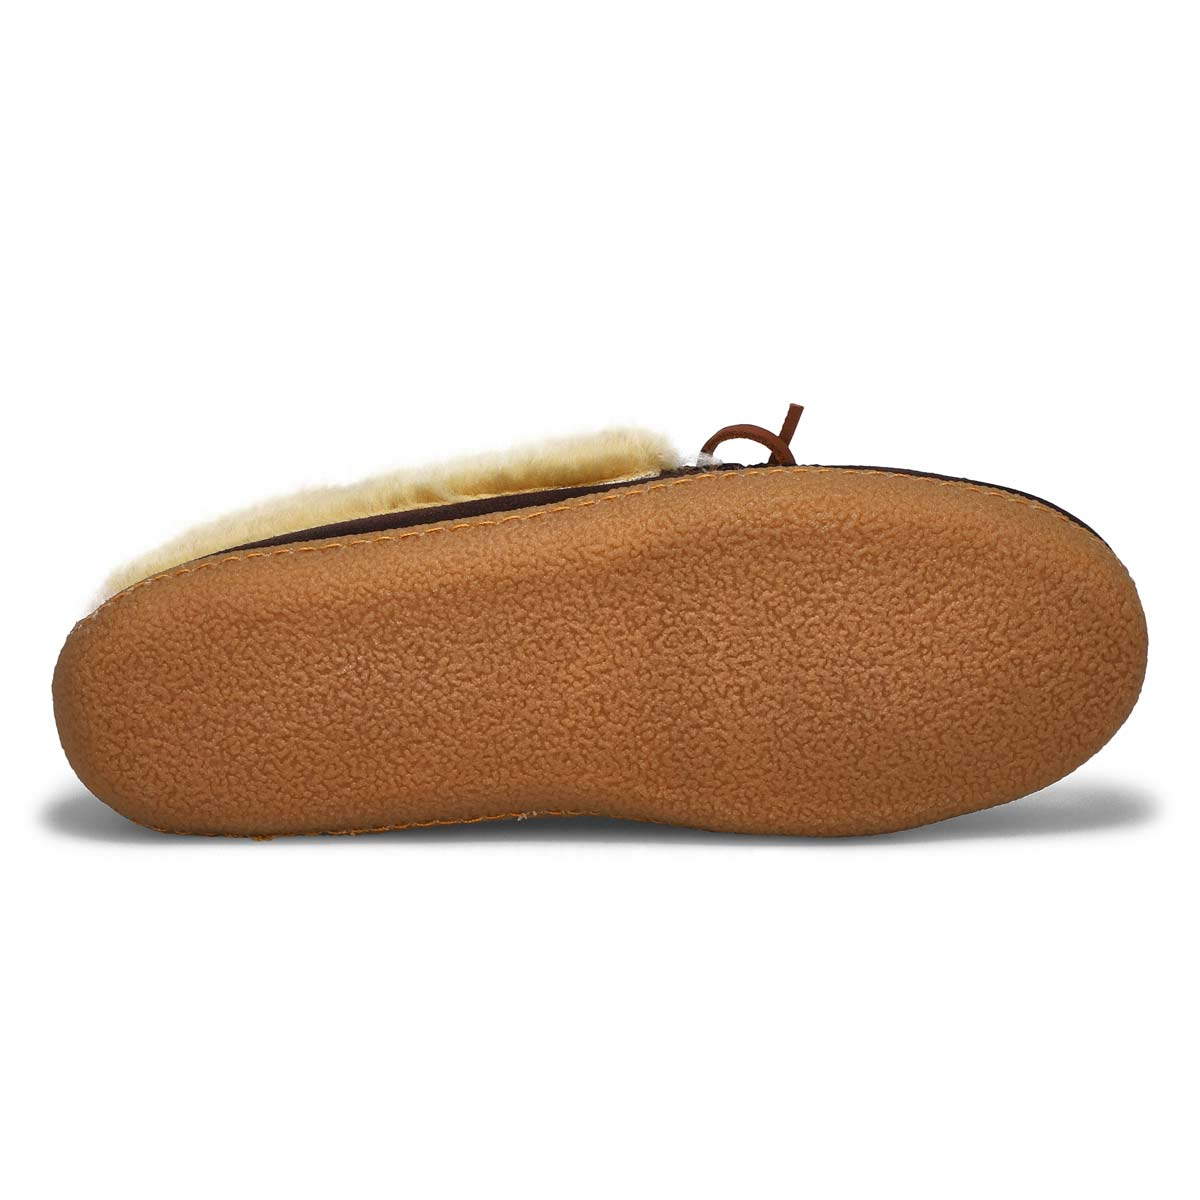 Men's DANIEL rootbeer crepe sole lined moccasins